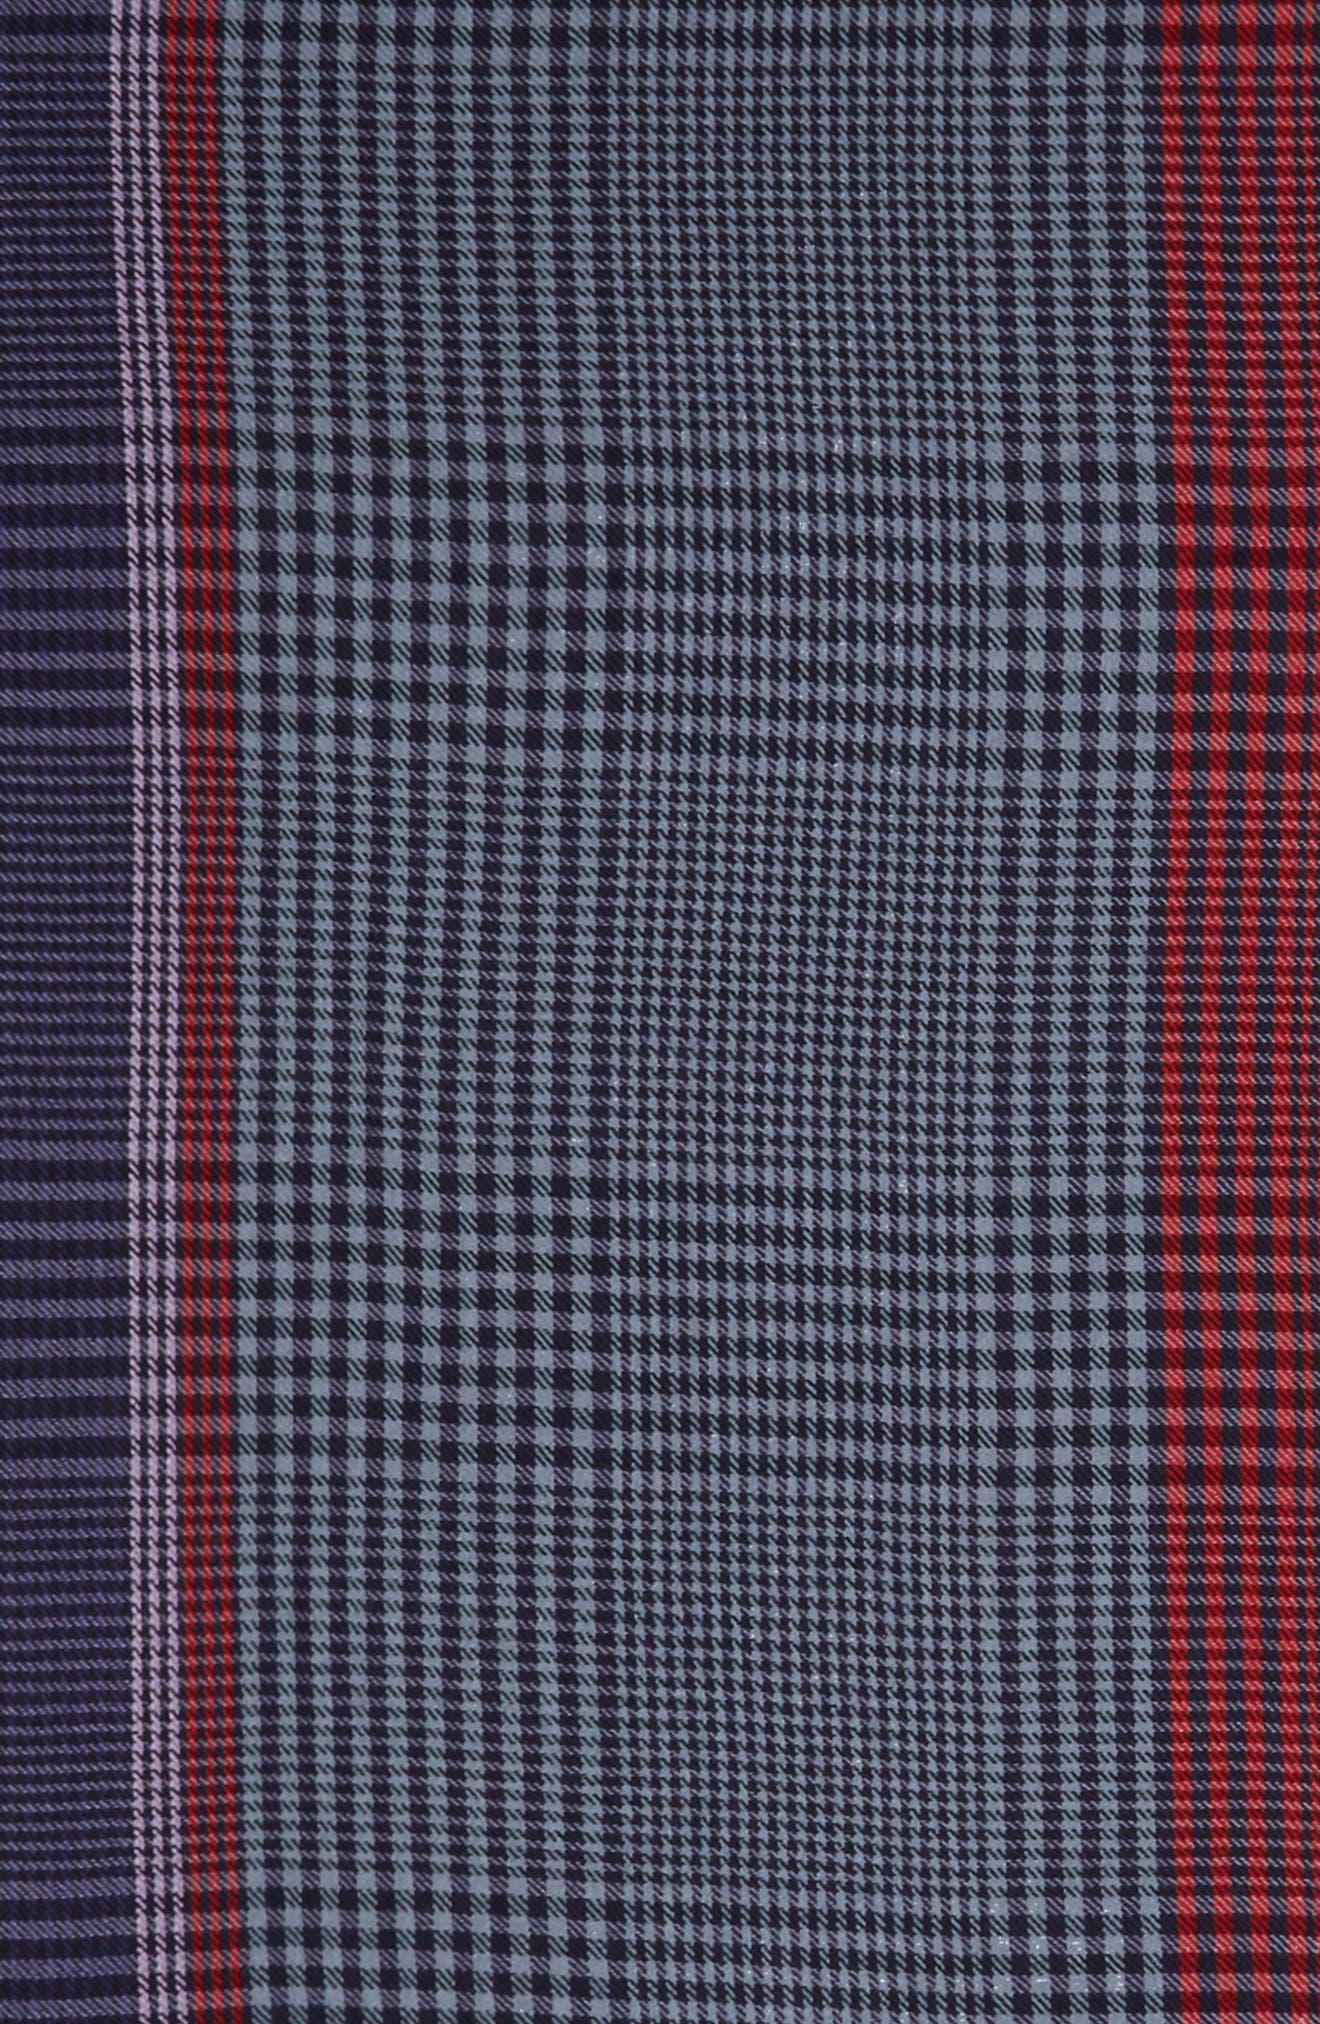 Multicolor Check Scarf,                             Alternate thumbnail 2, color,                             Blue/ Red Multi